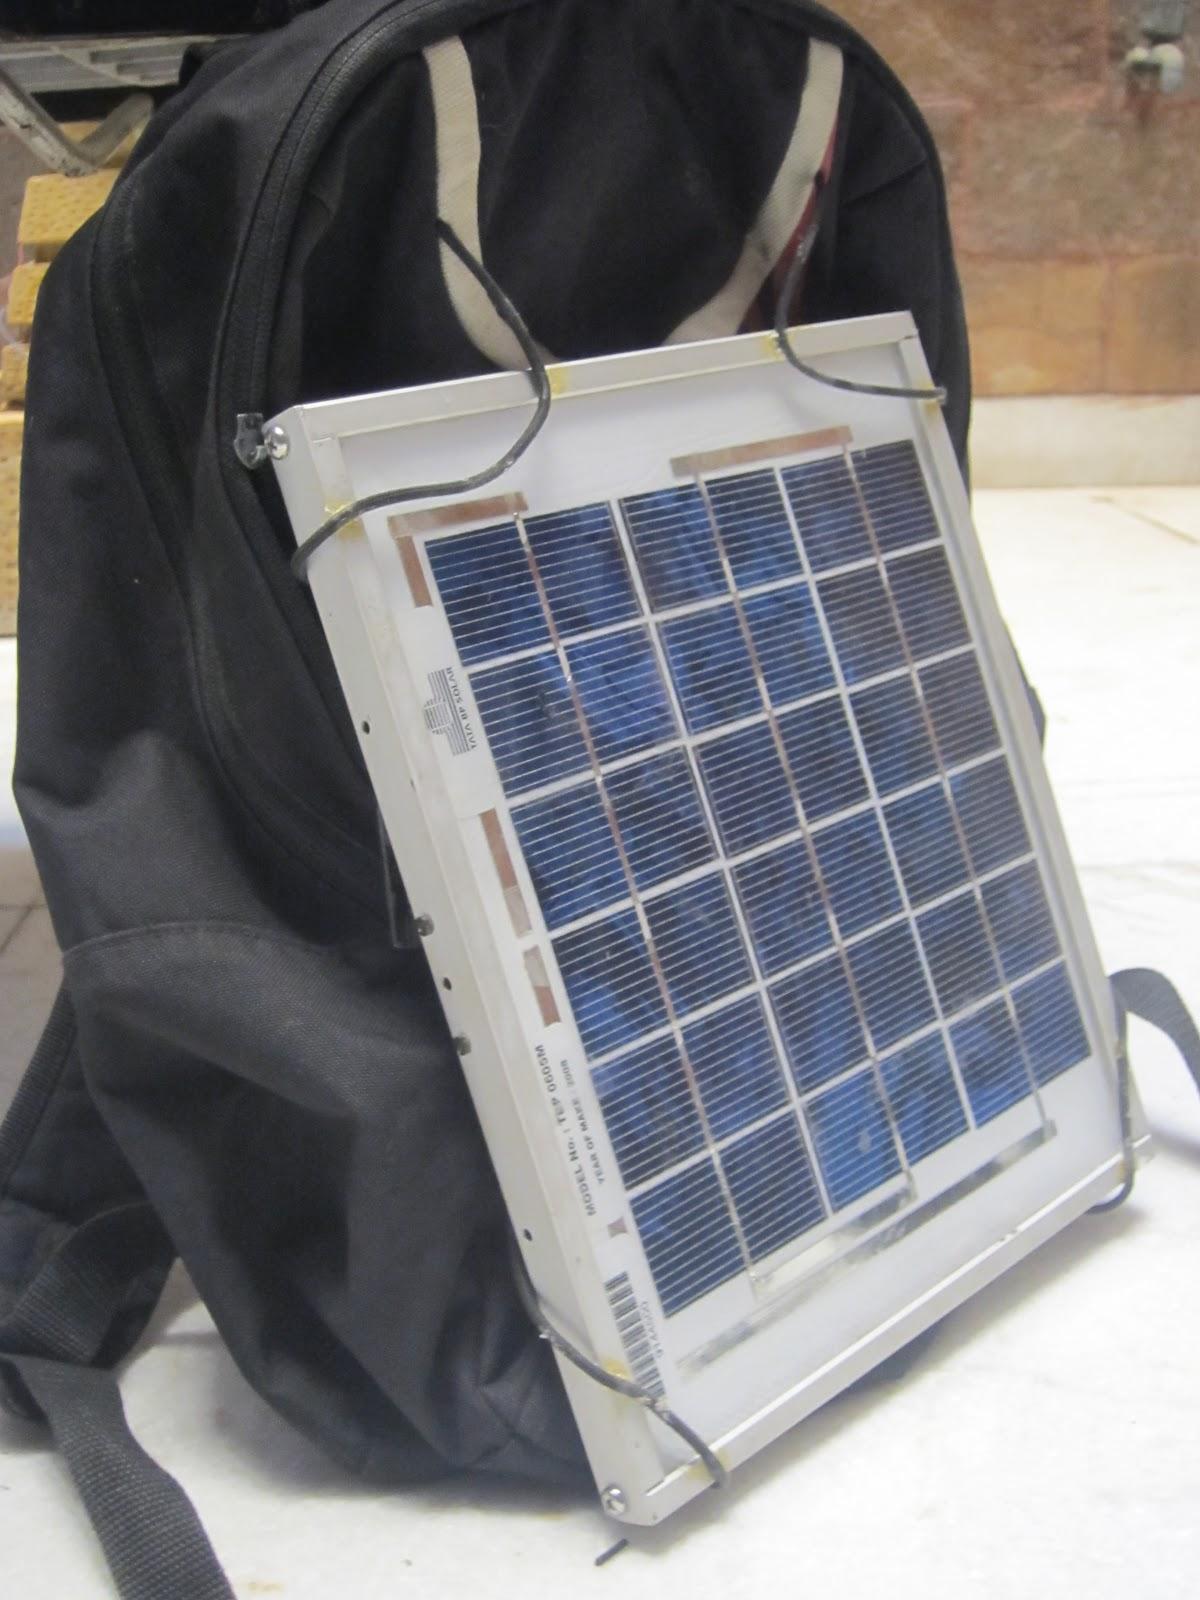 My Solar Adventures Diy Solar And Arduino Projects